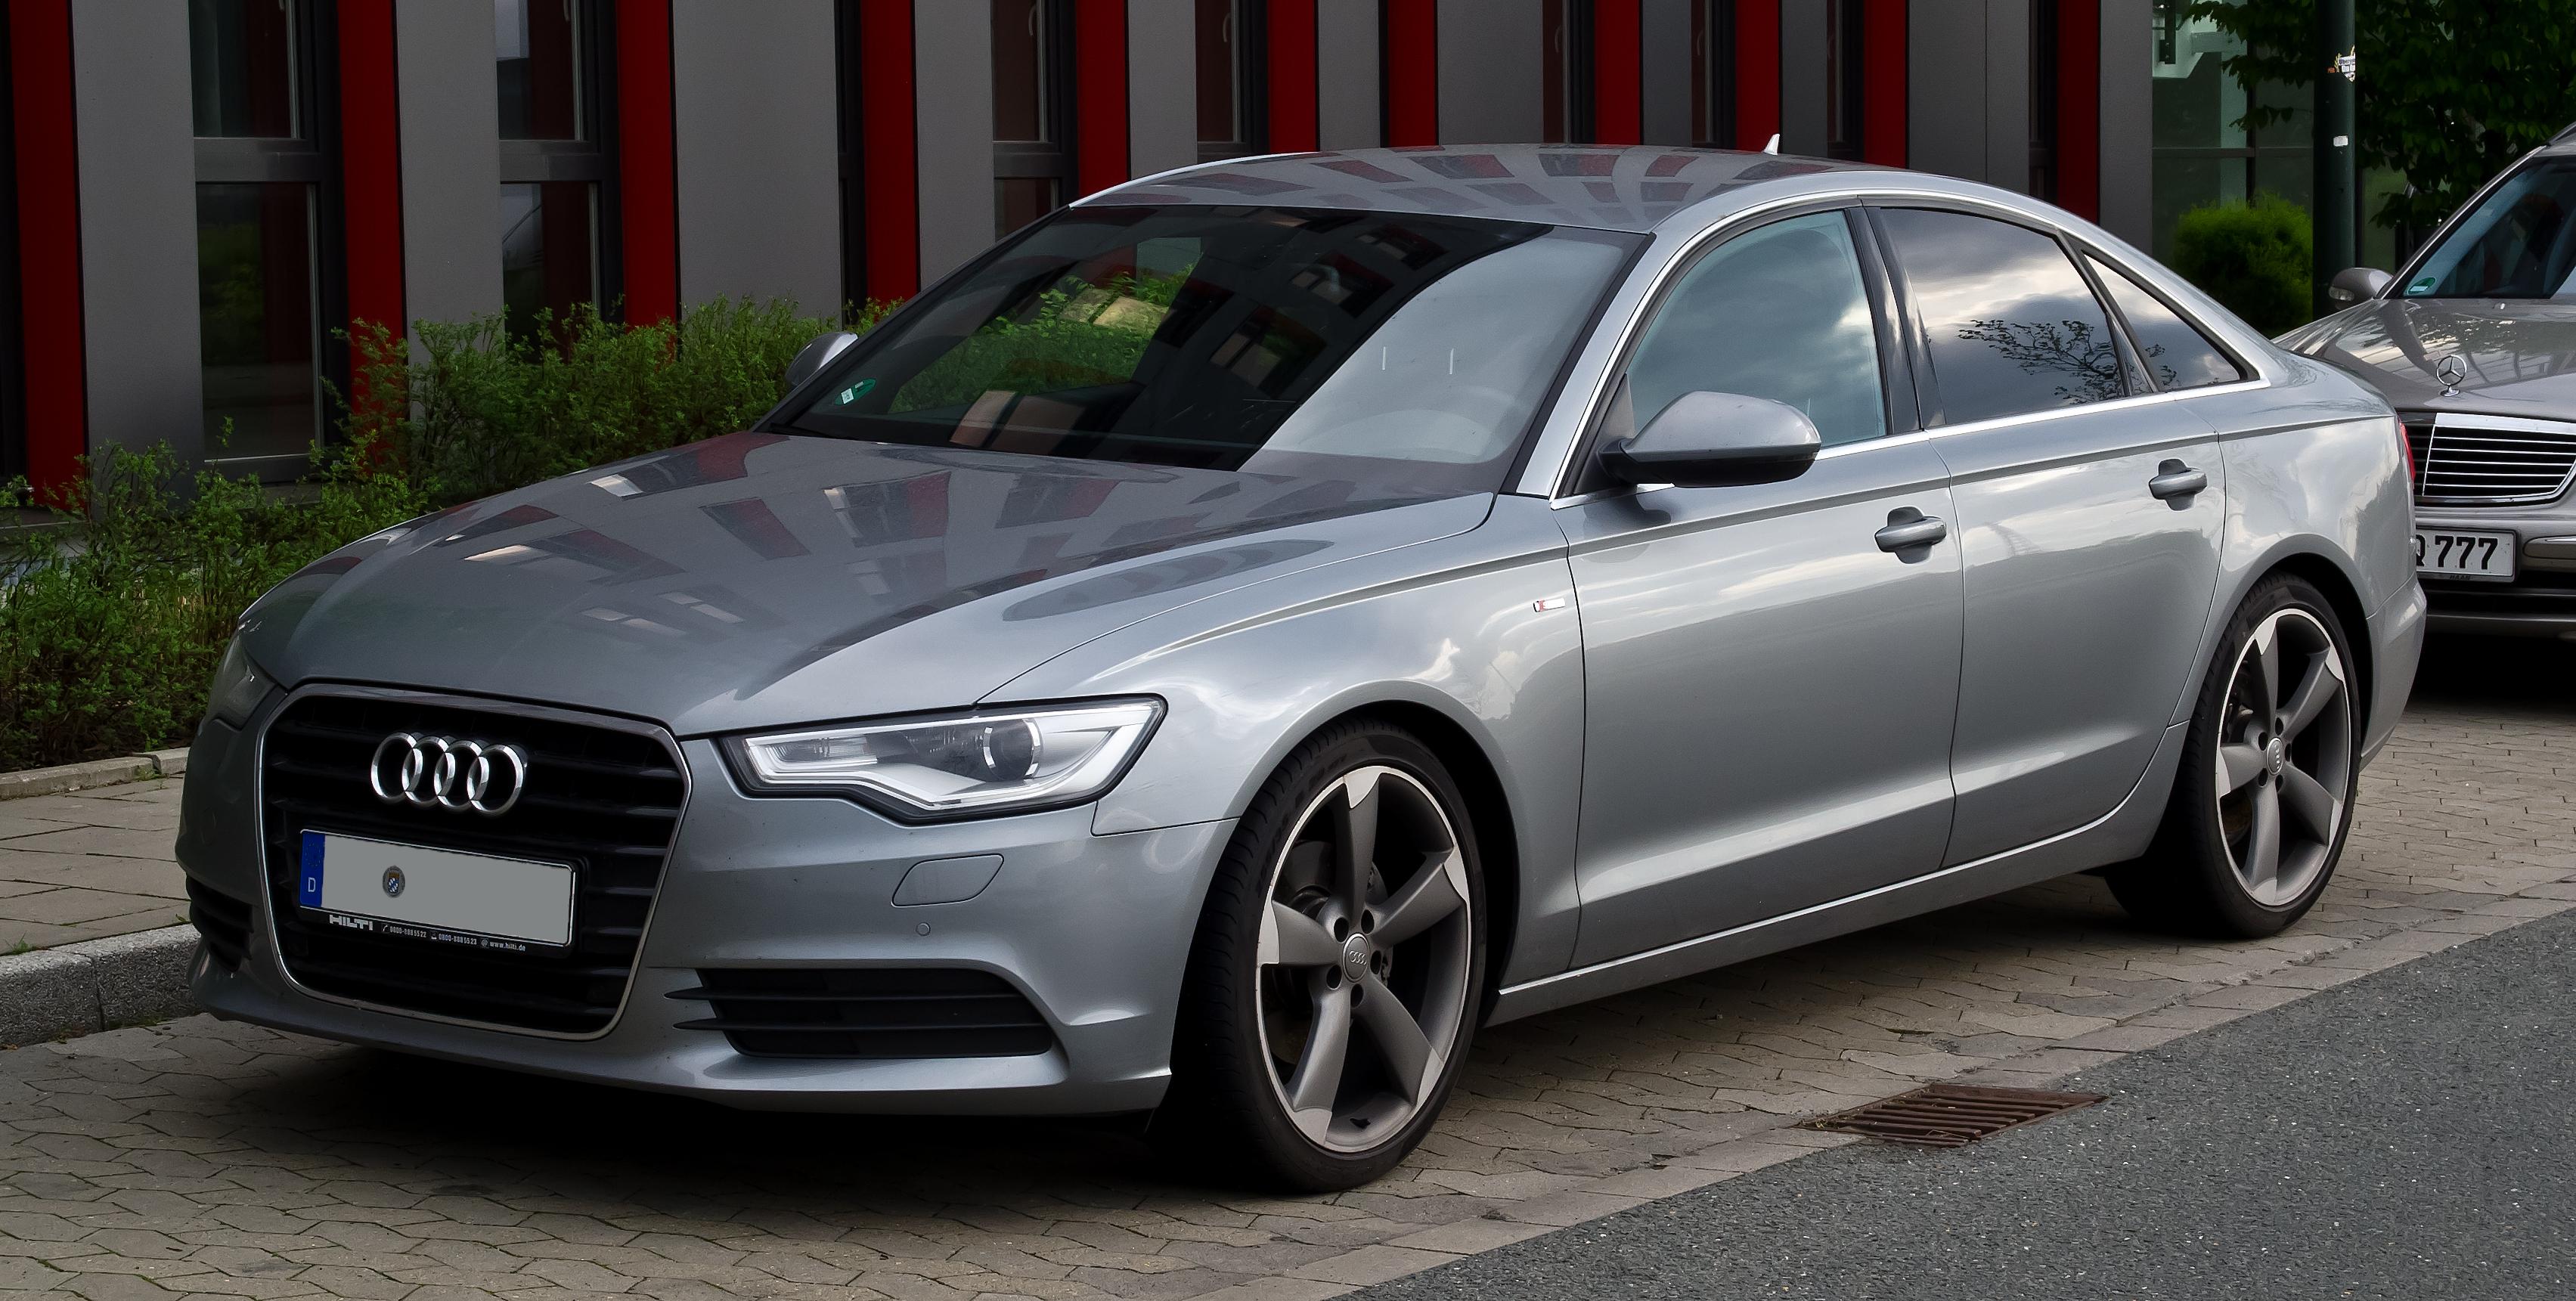 File Audi A6 S Line C7 Frontansicht 1 Mai 2012